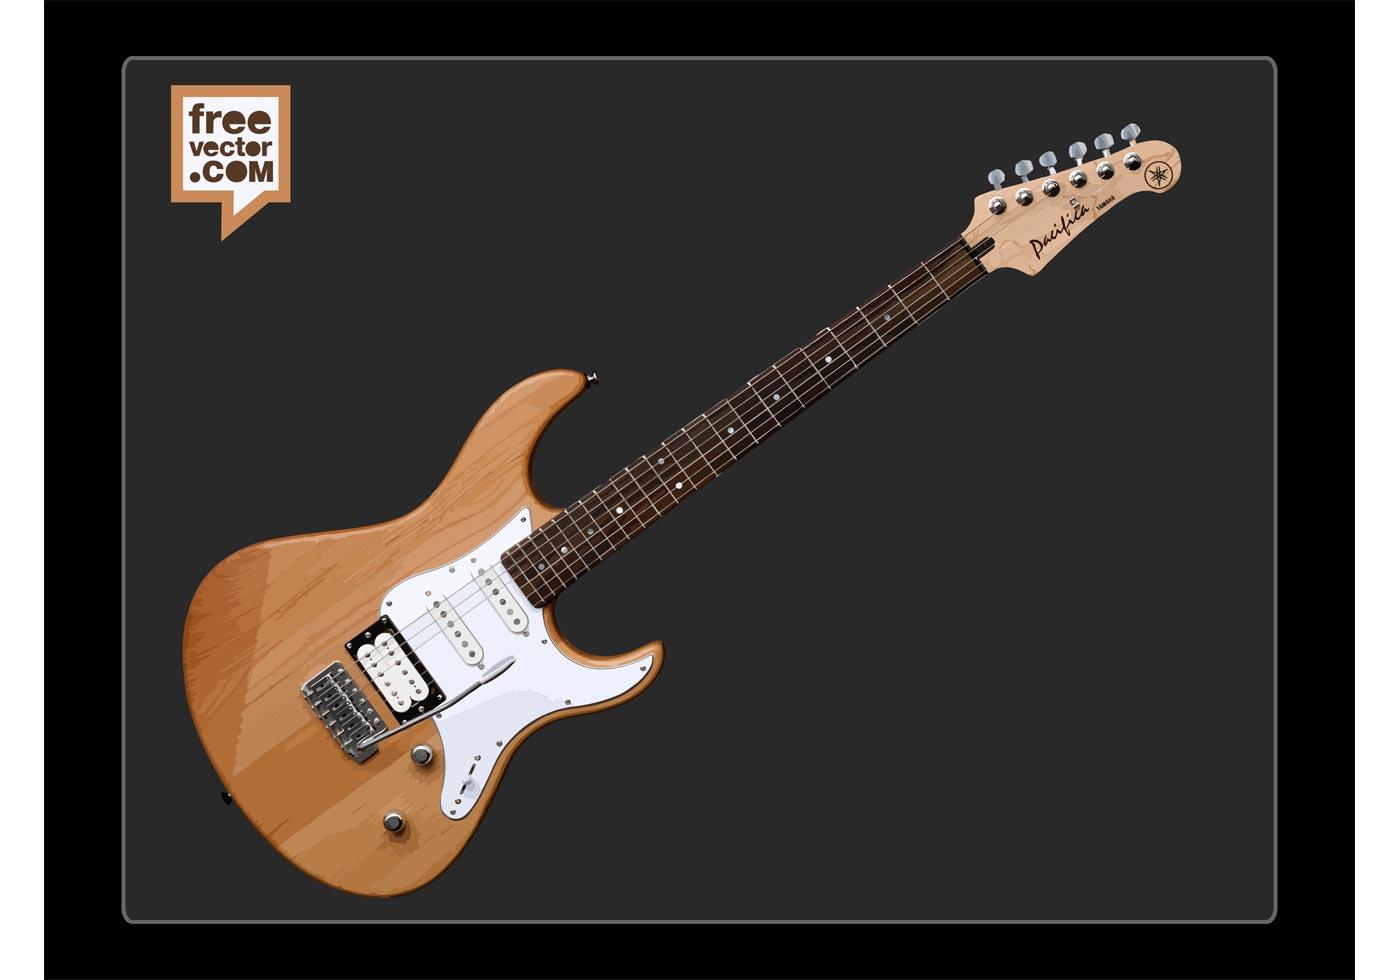 yamaha pacifica electric guitar download free vectors clipart graphics vector art. Black Bedroom Furniture Sets. Home Design Ideas